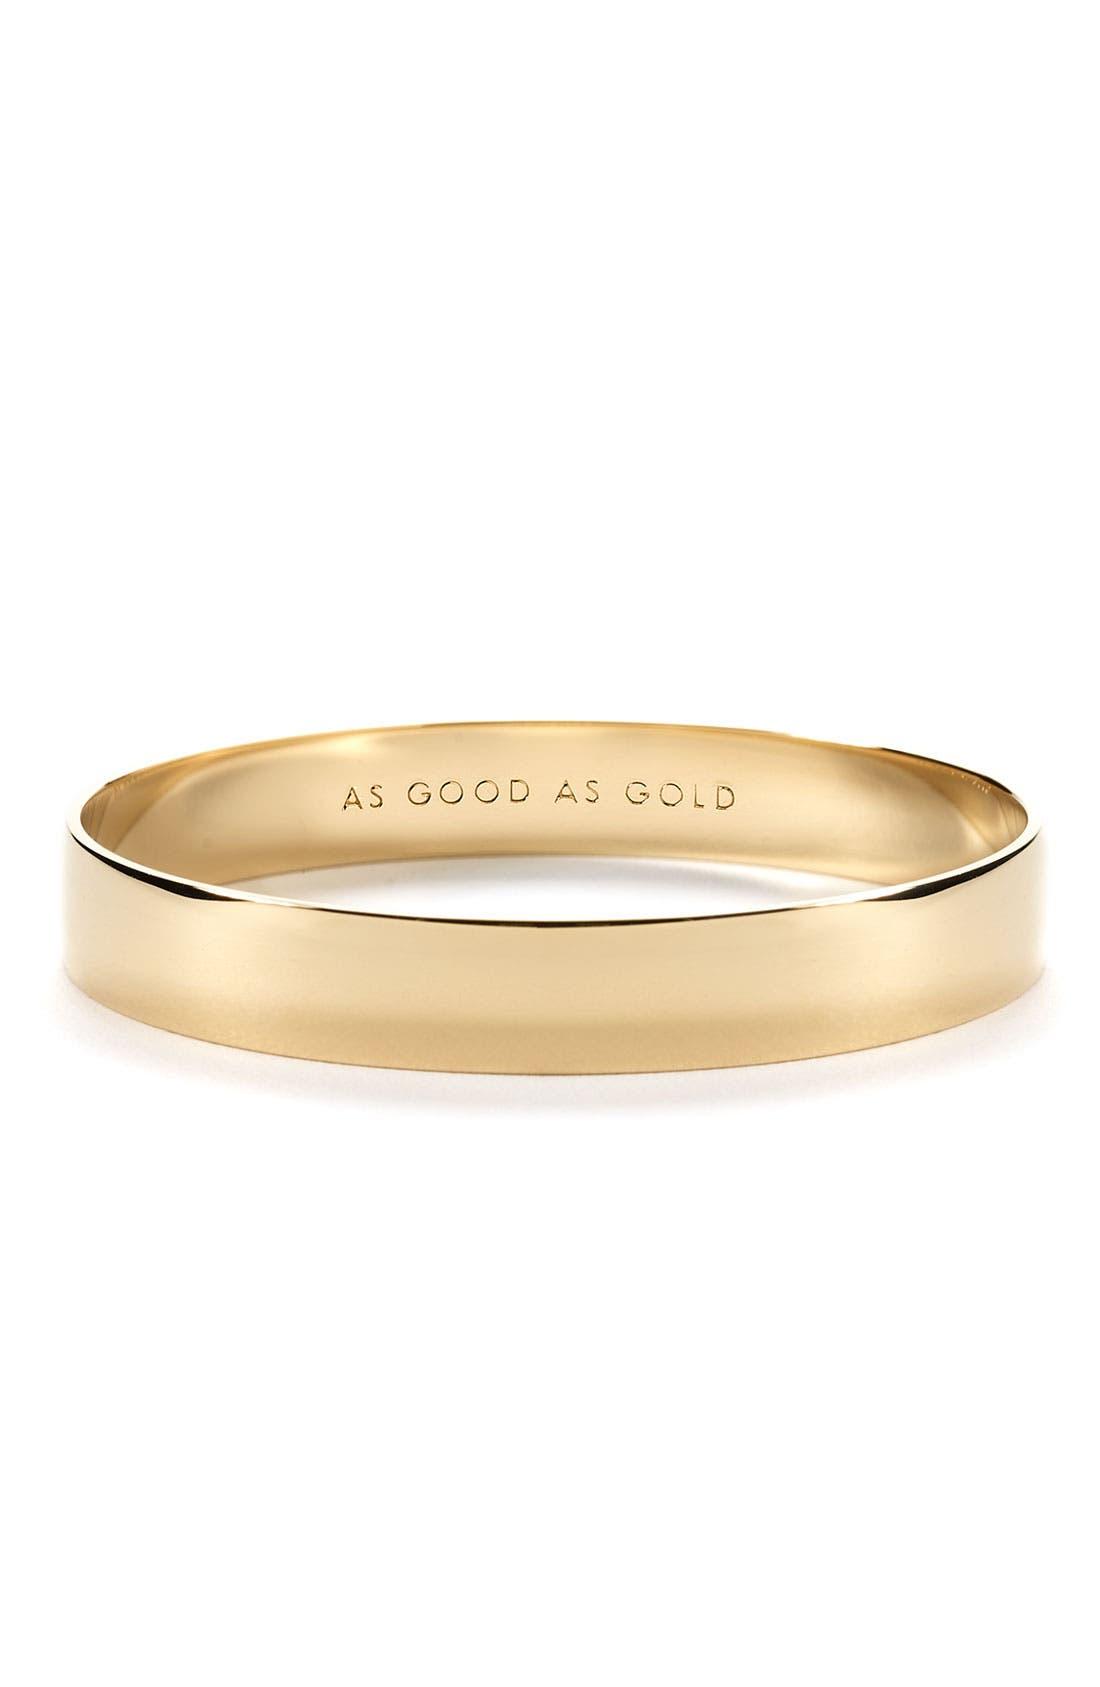 Alternate Image 1 Selected - kate spade new york 'idiom - good as gold' bangle